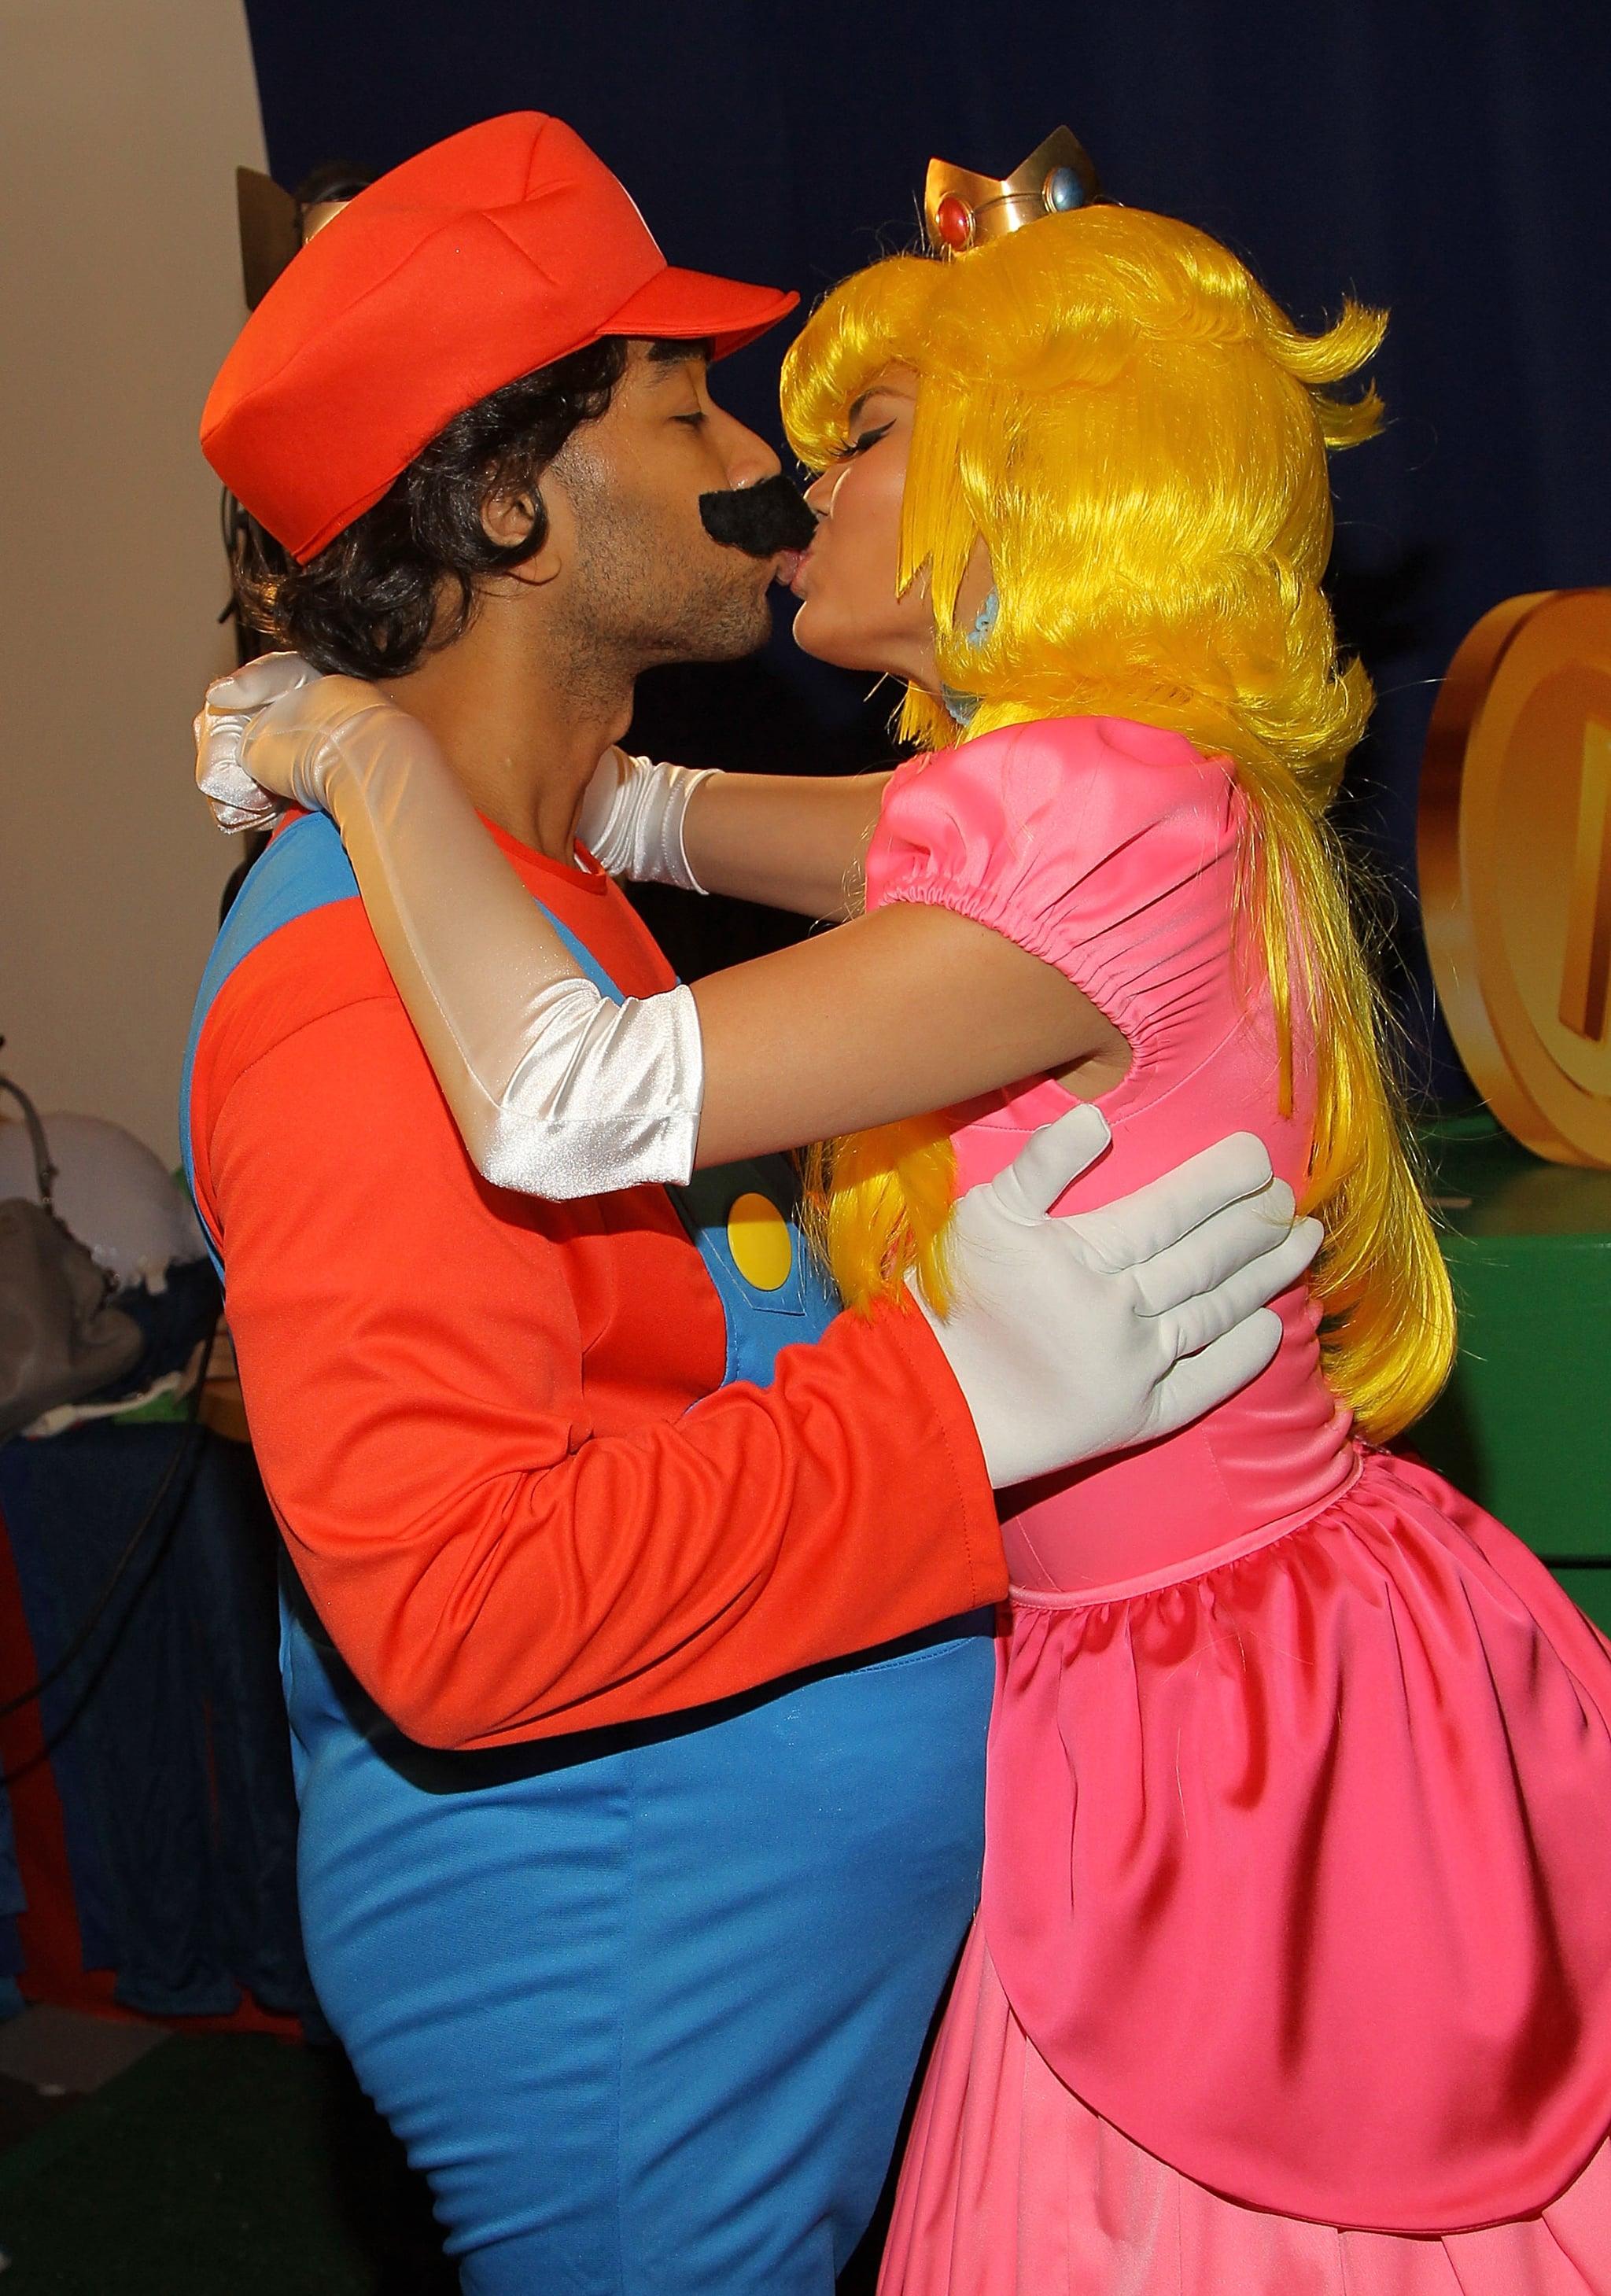 Chrissy teigen and john legend as princess peach and mario - Princesse dans mario ...